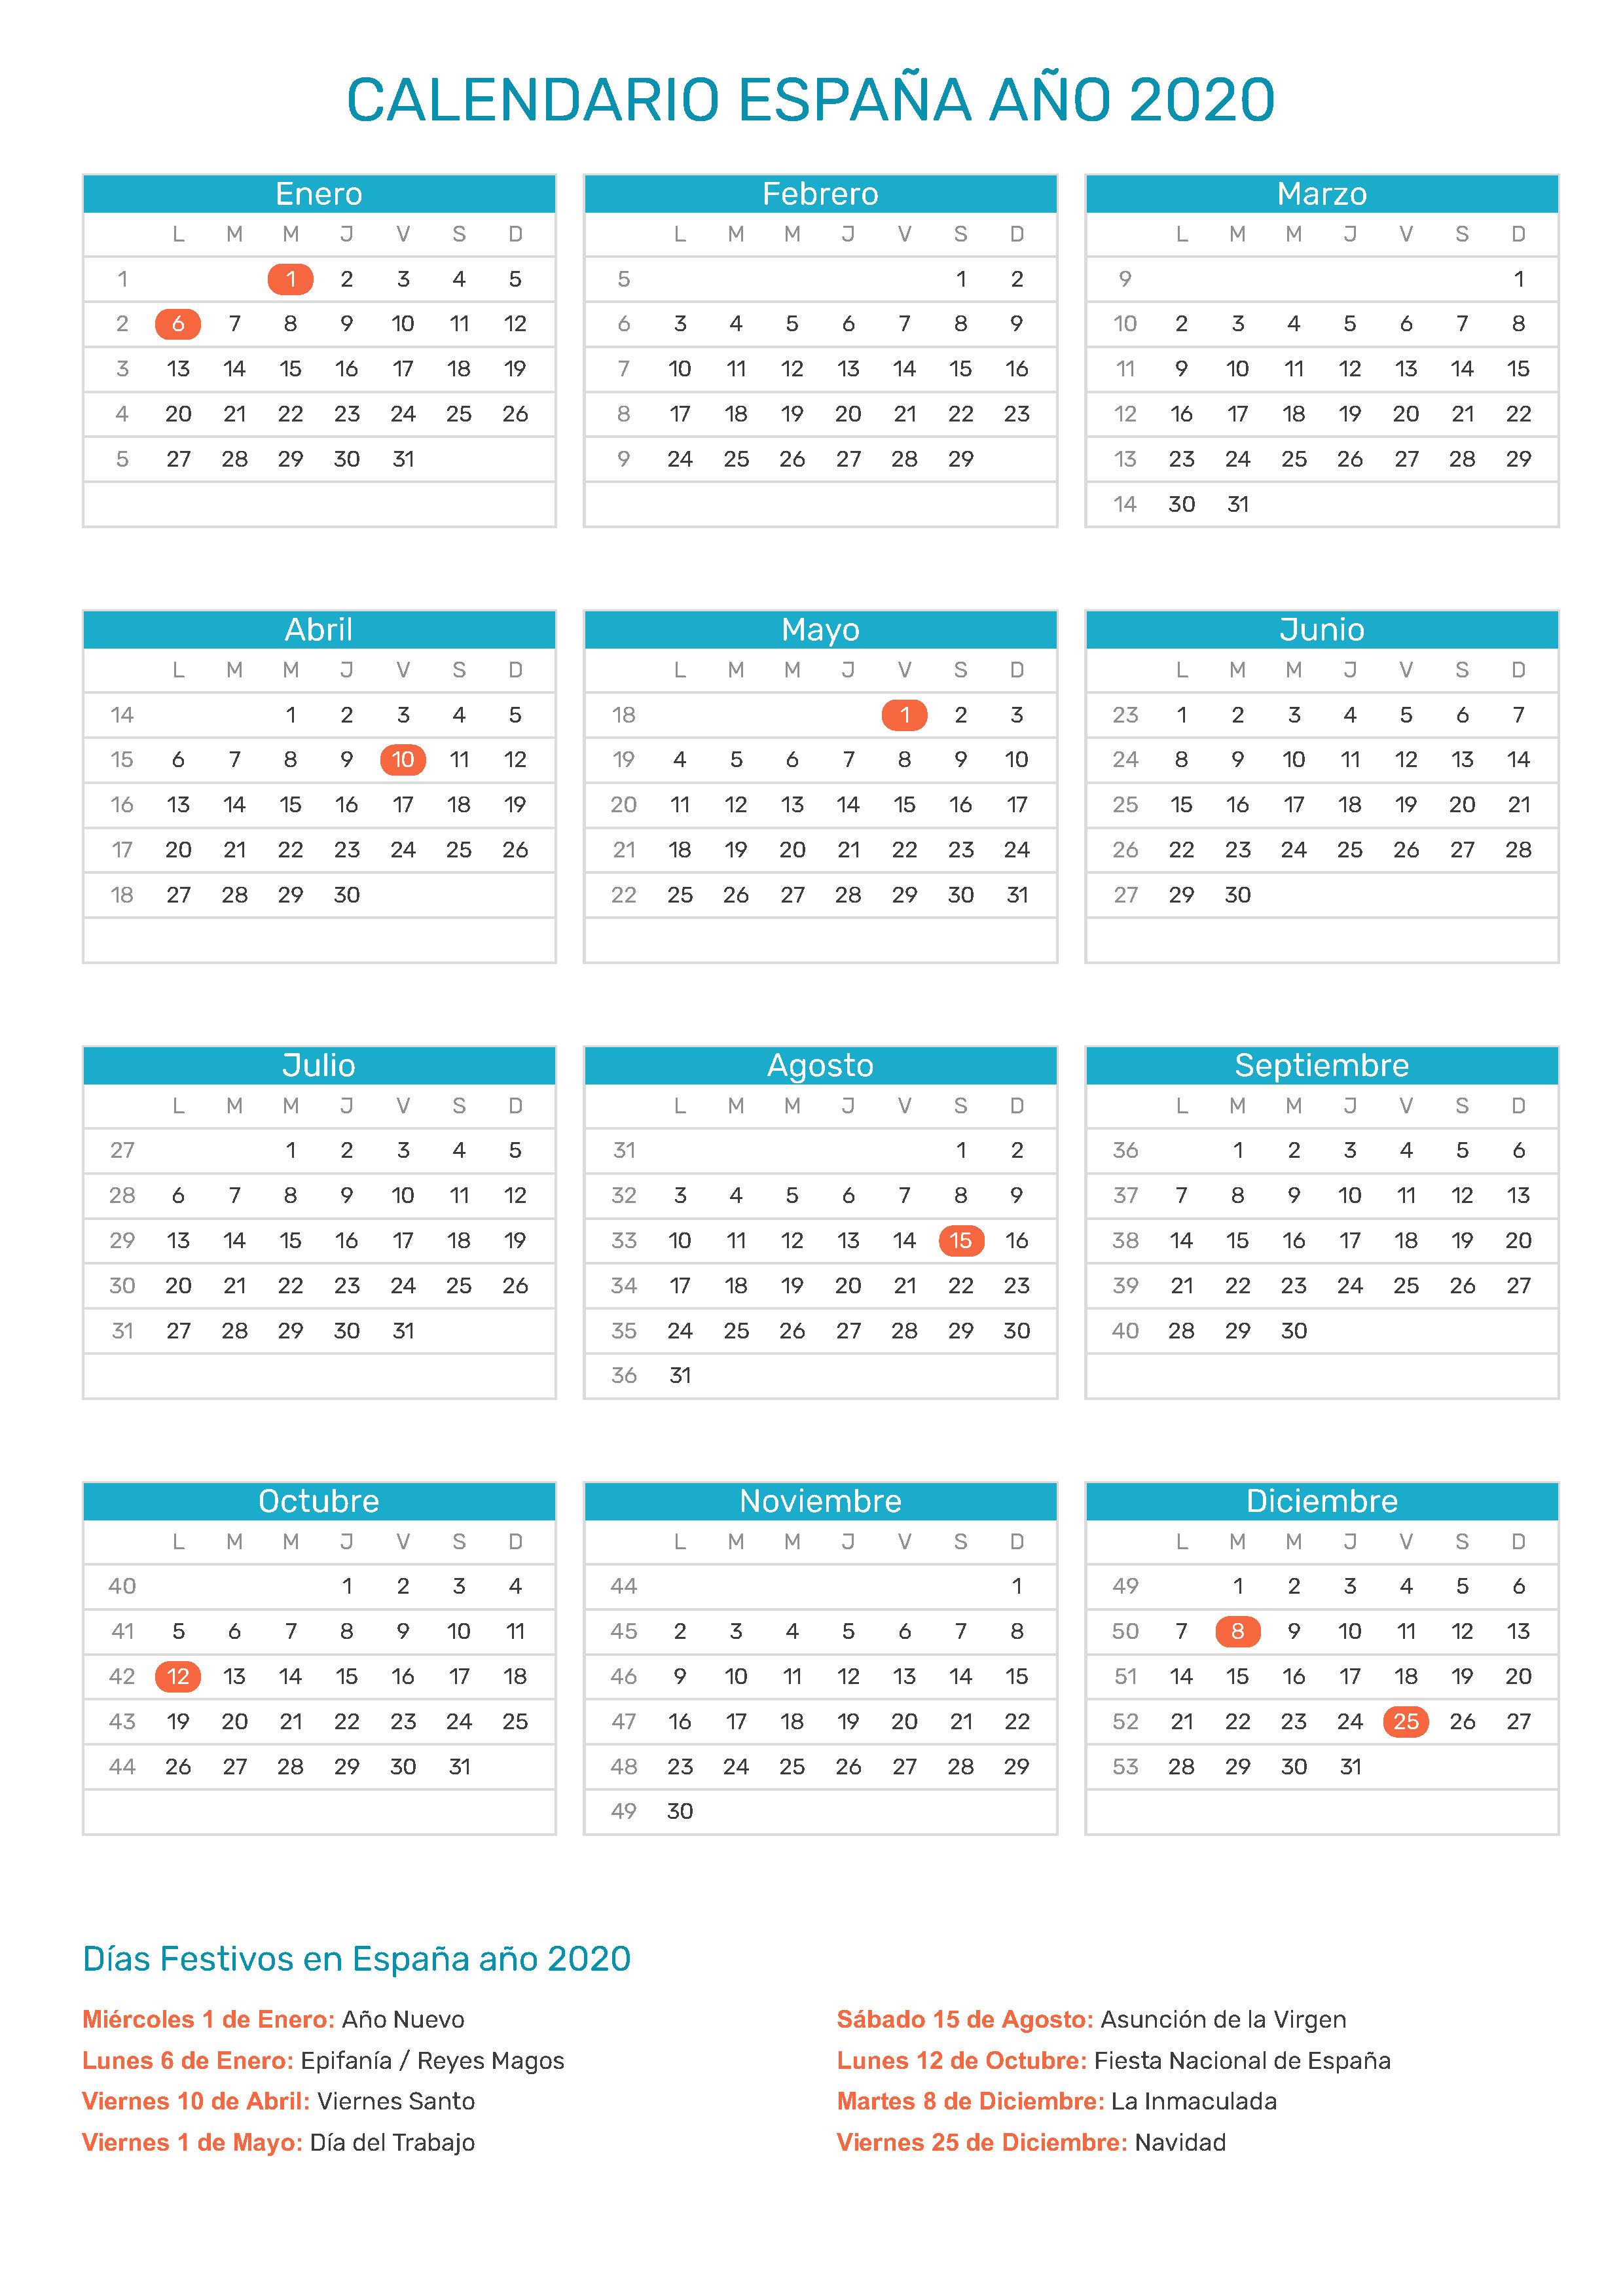 Calendario 2020 Espana Con Festivos.Calendario De Espana Ano 2020 Feriados